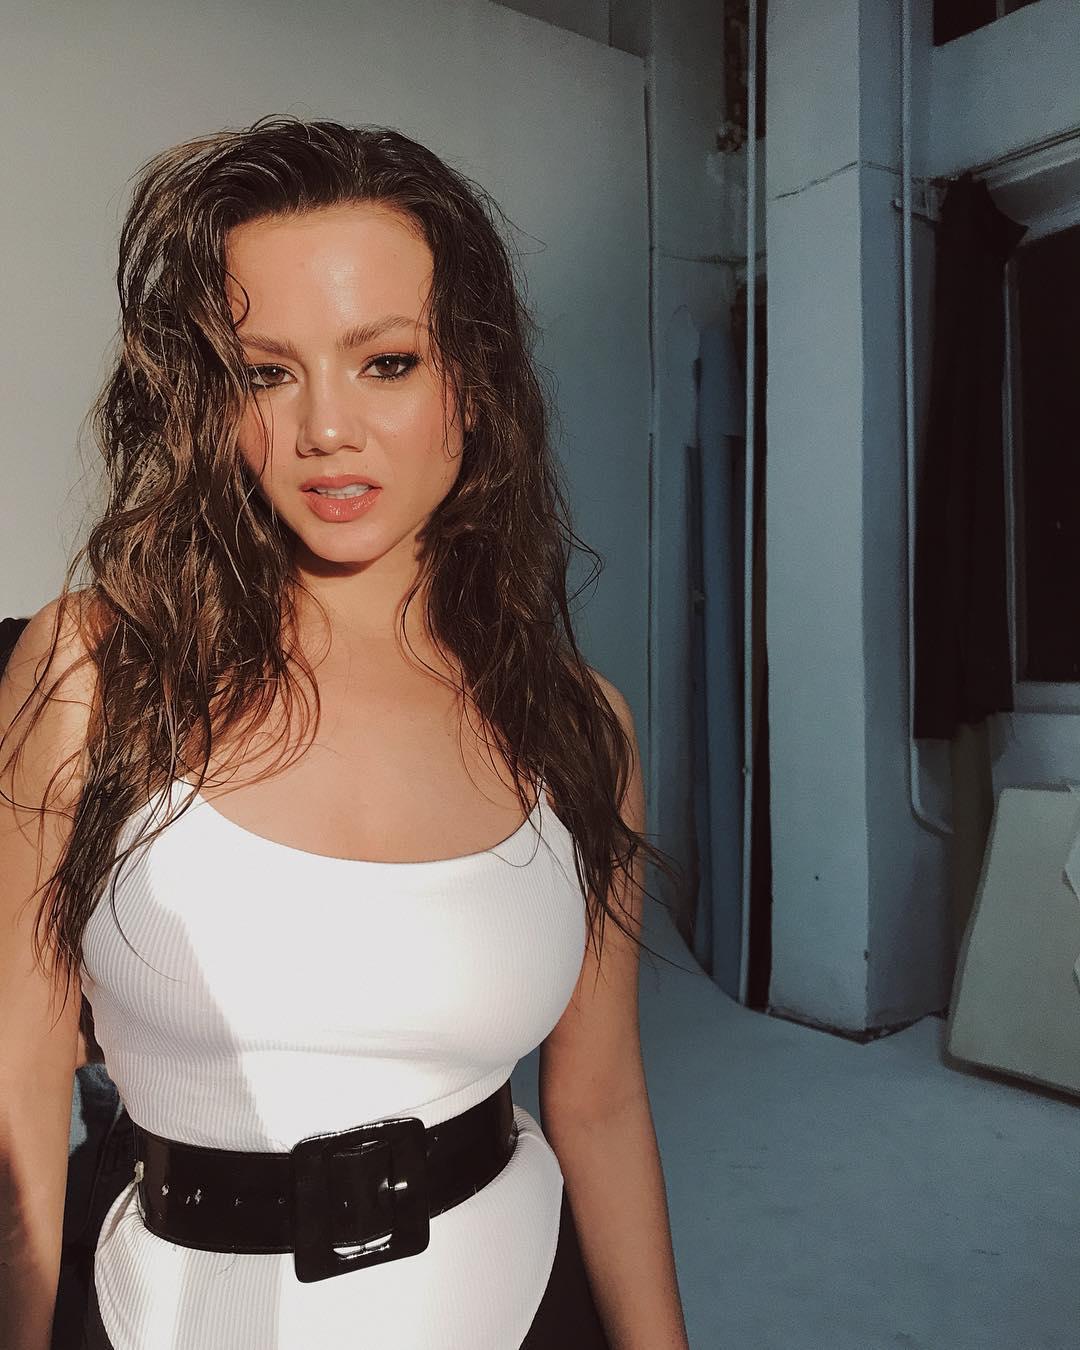 Polina Glen in white top and black shorts